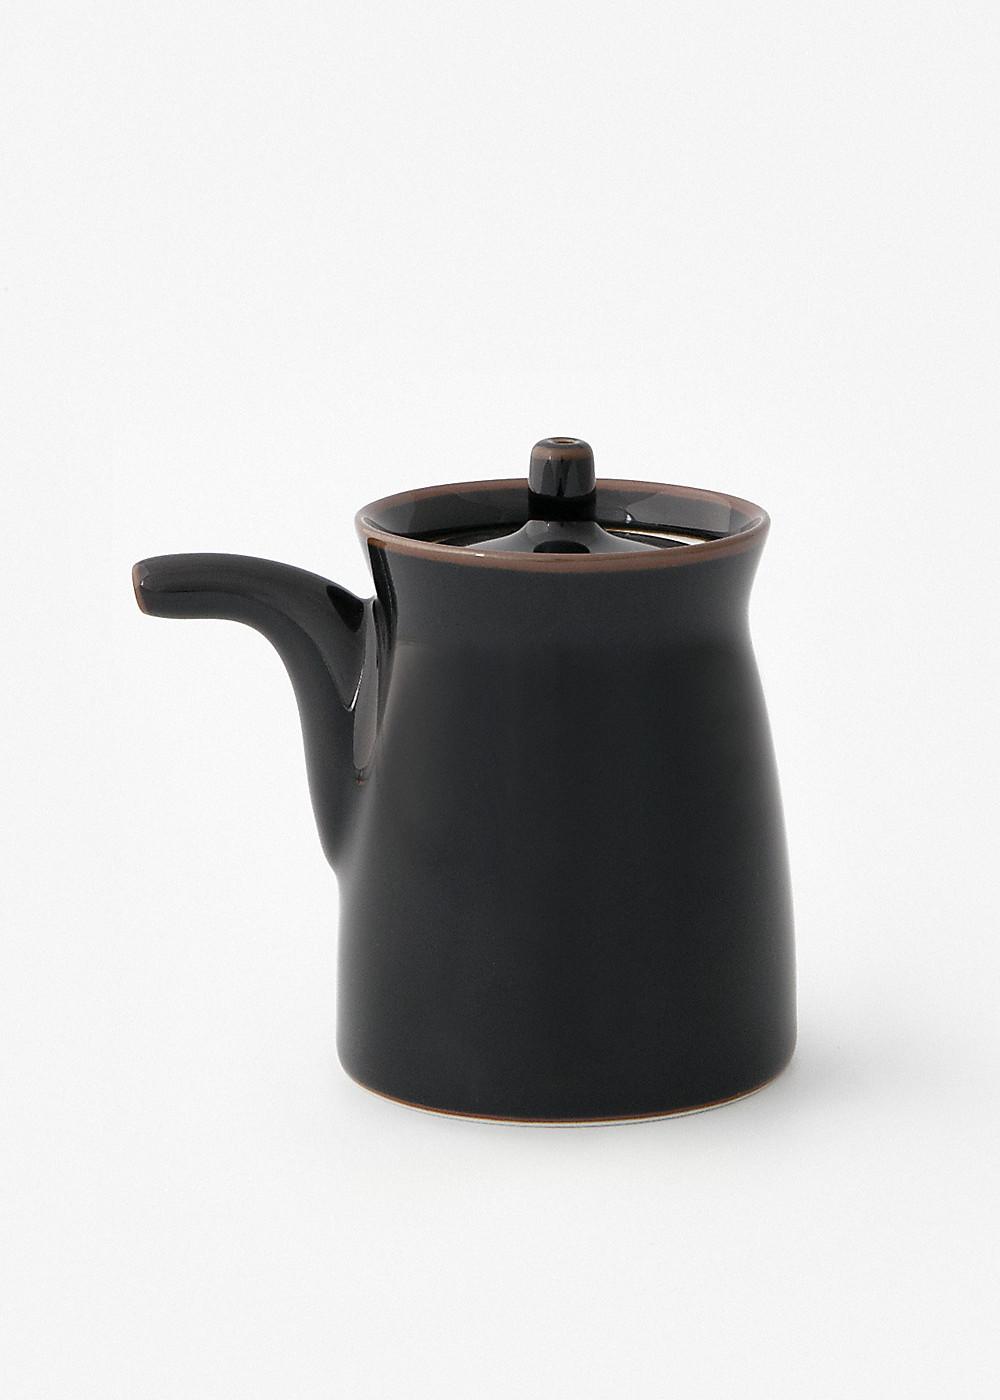 Hakusanporcelain-Gtype-Soy-Sauce-dispenser-Black1